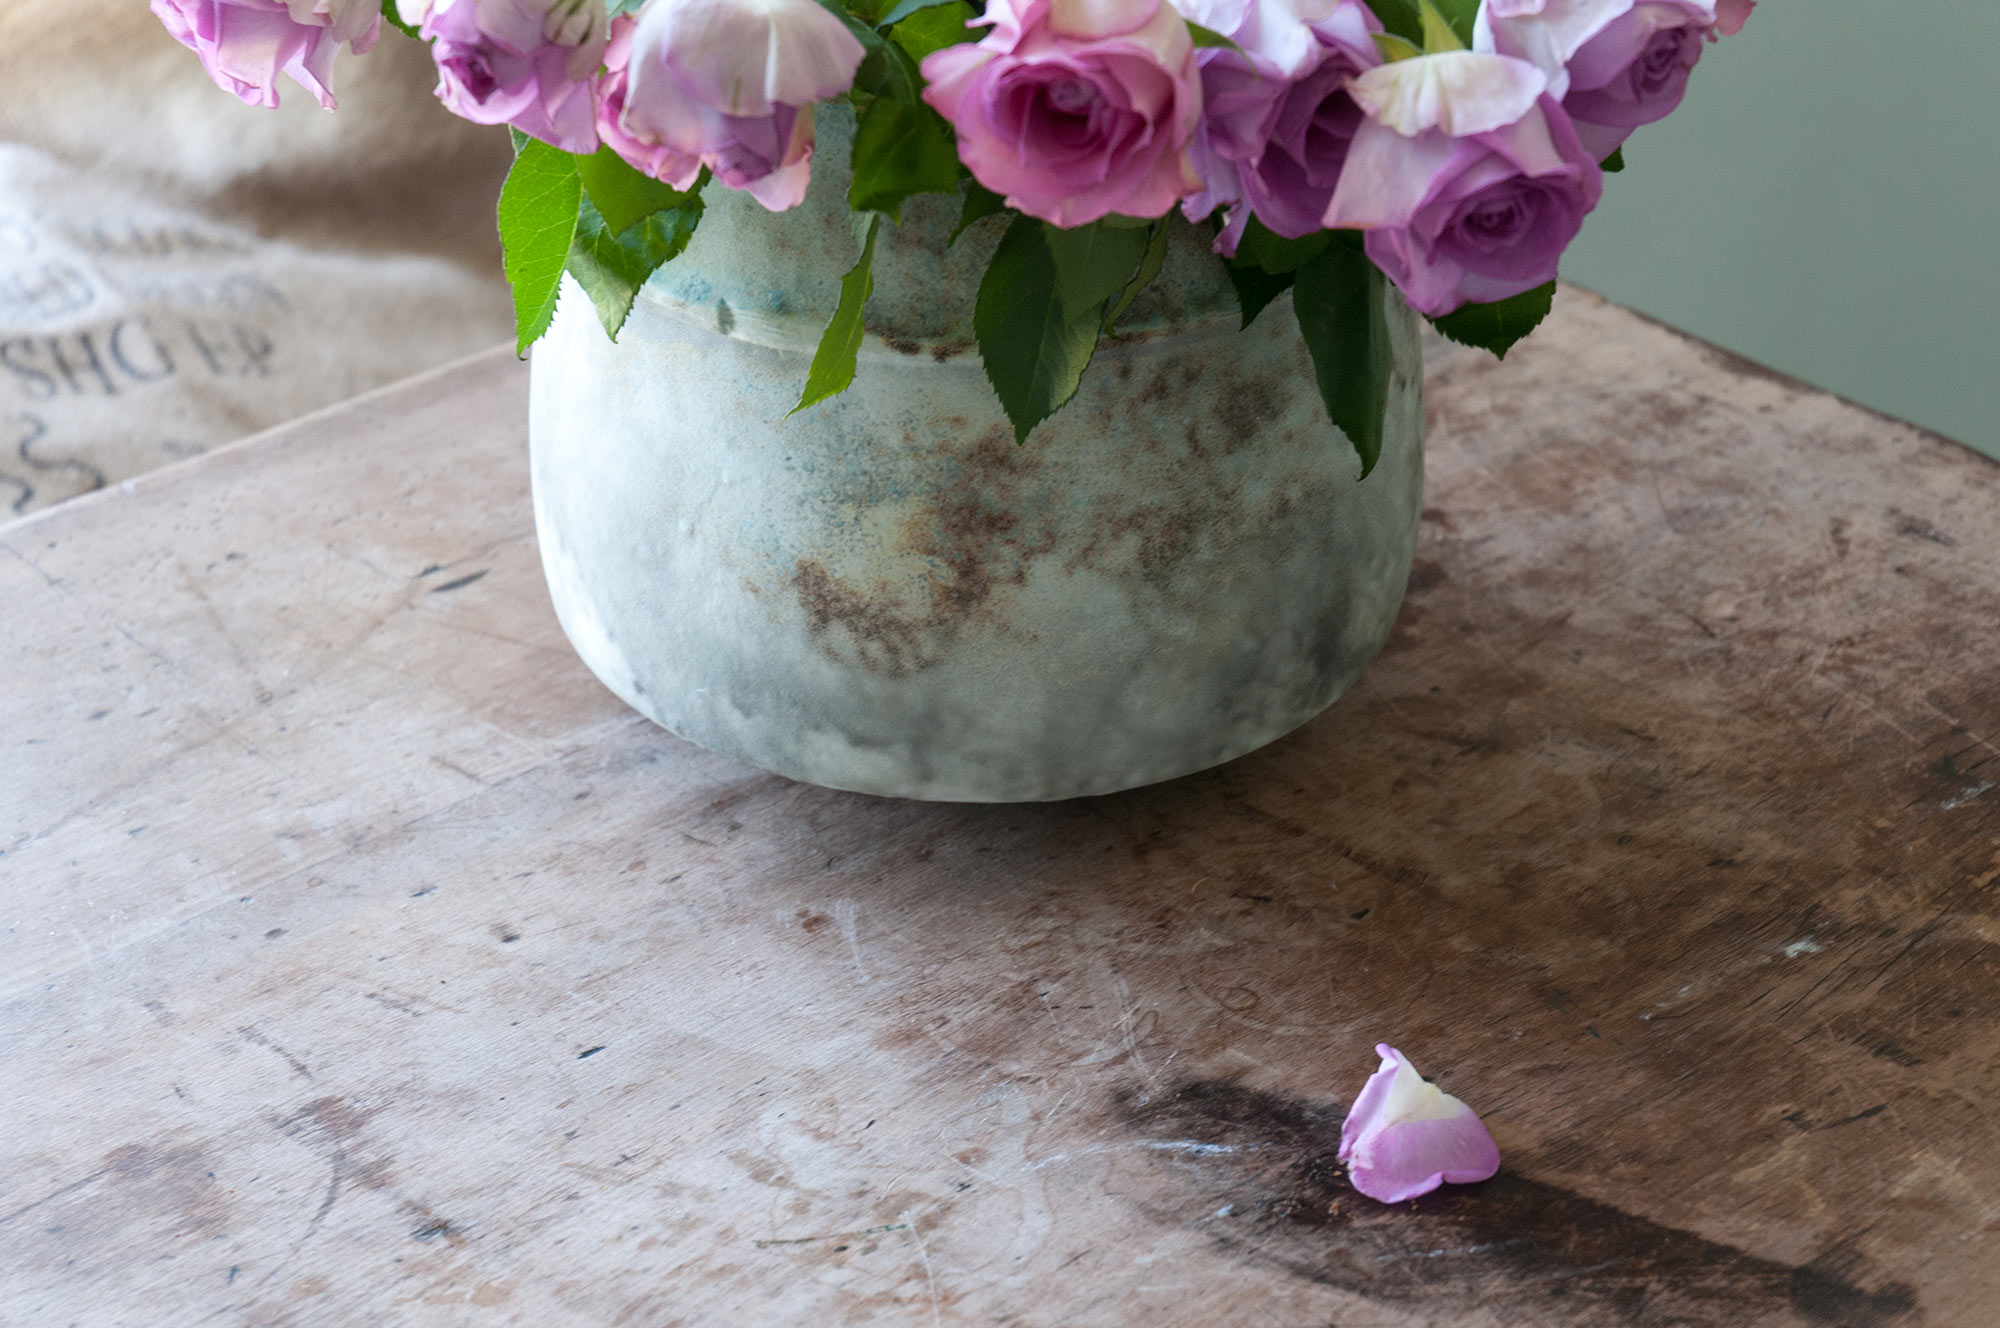 doherty-porcelain-roses-vase.jpg